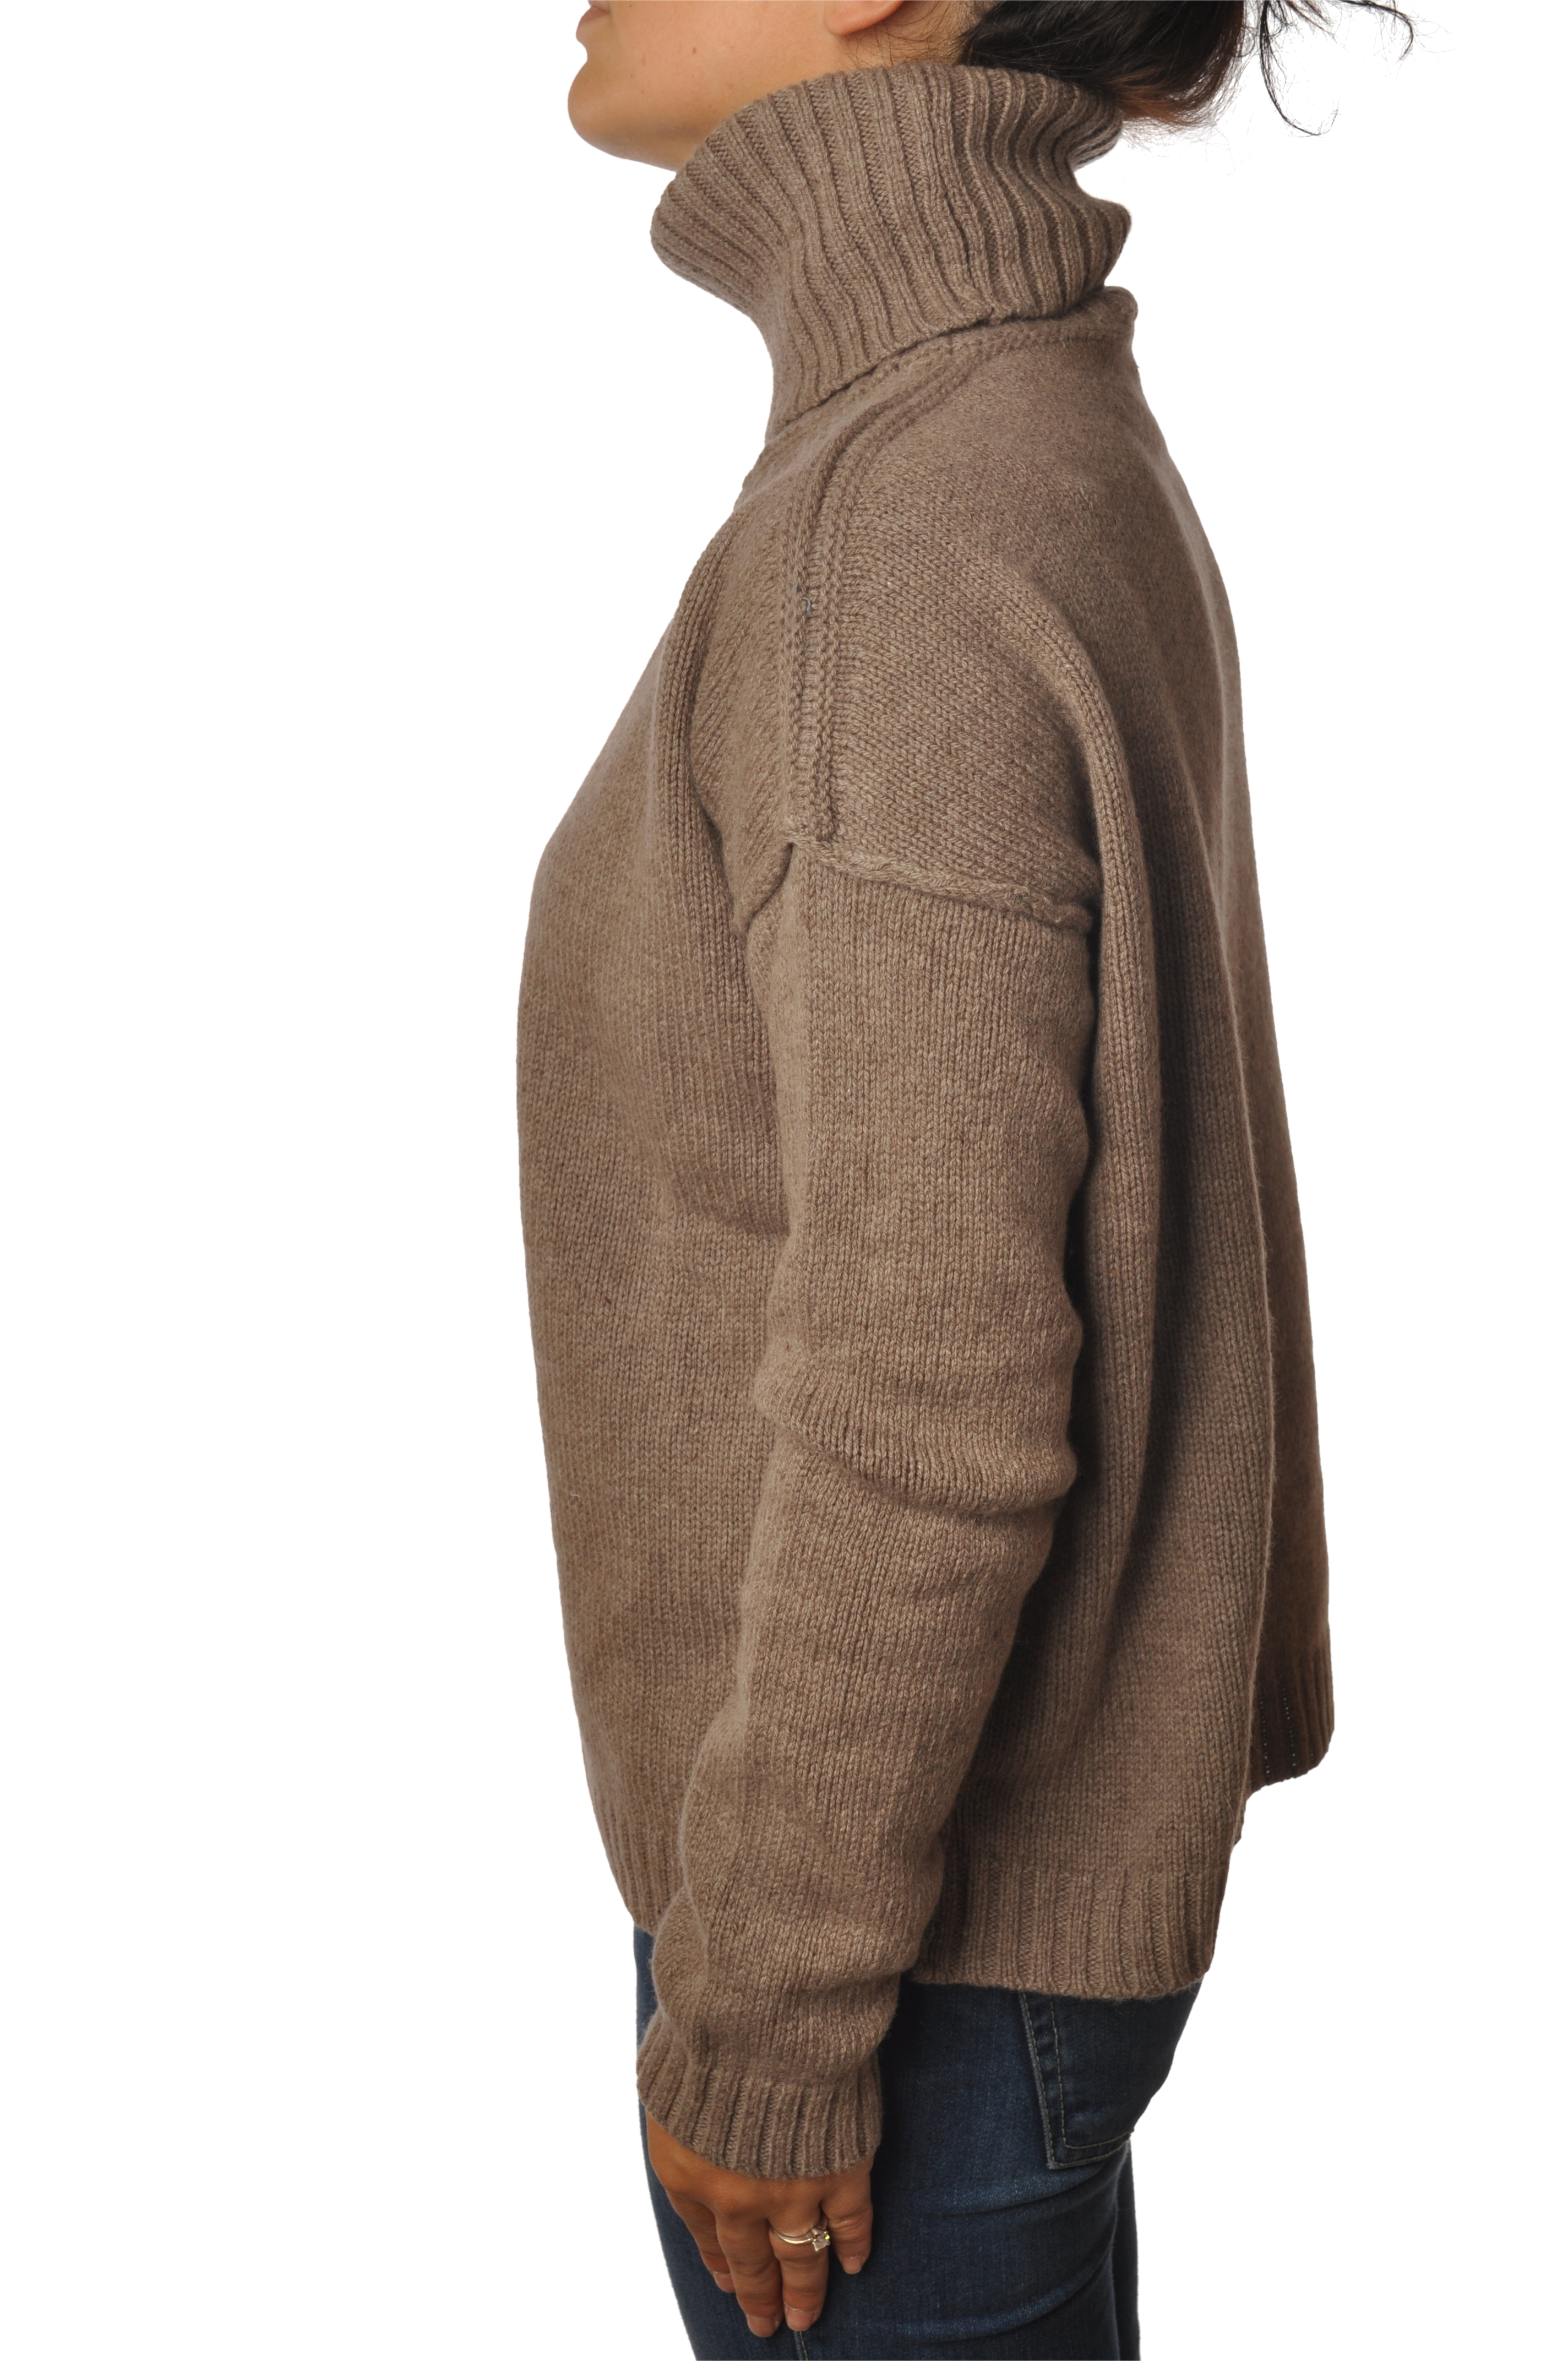 CROSSLEY - Pullover